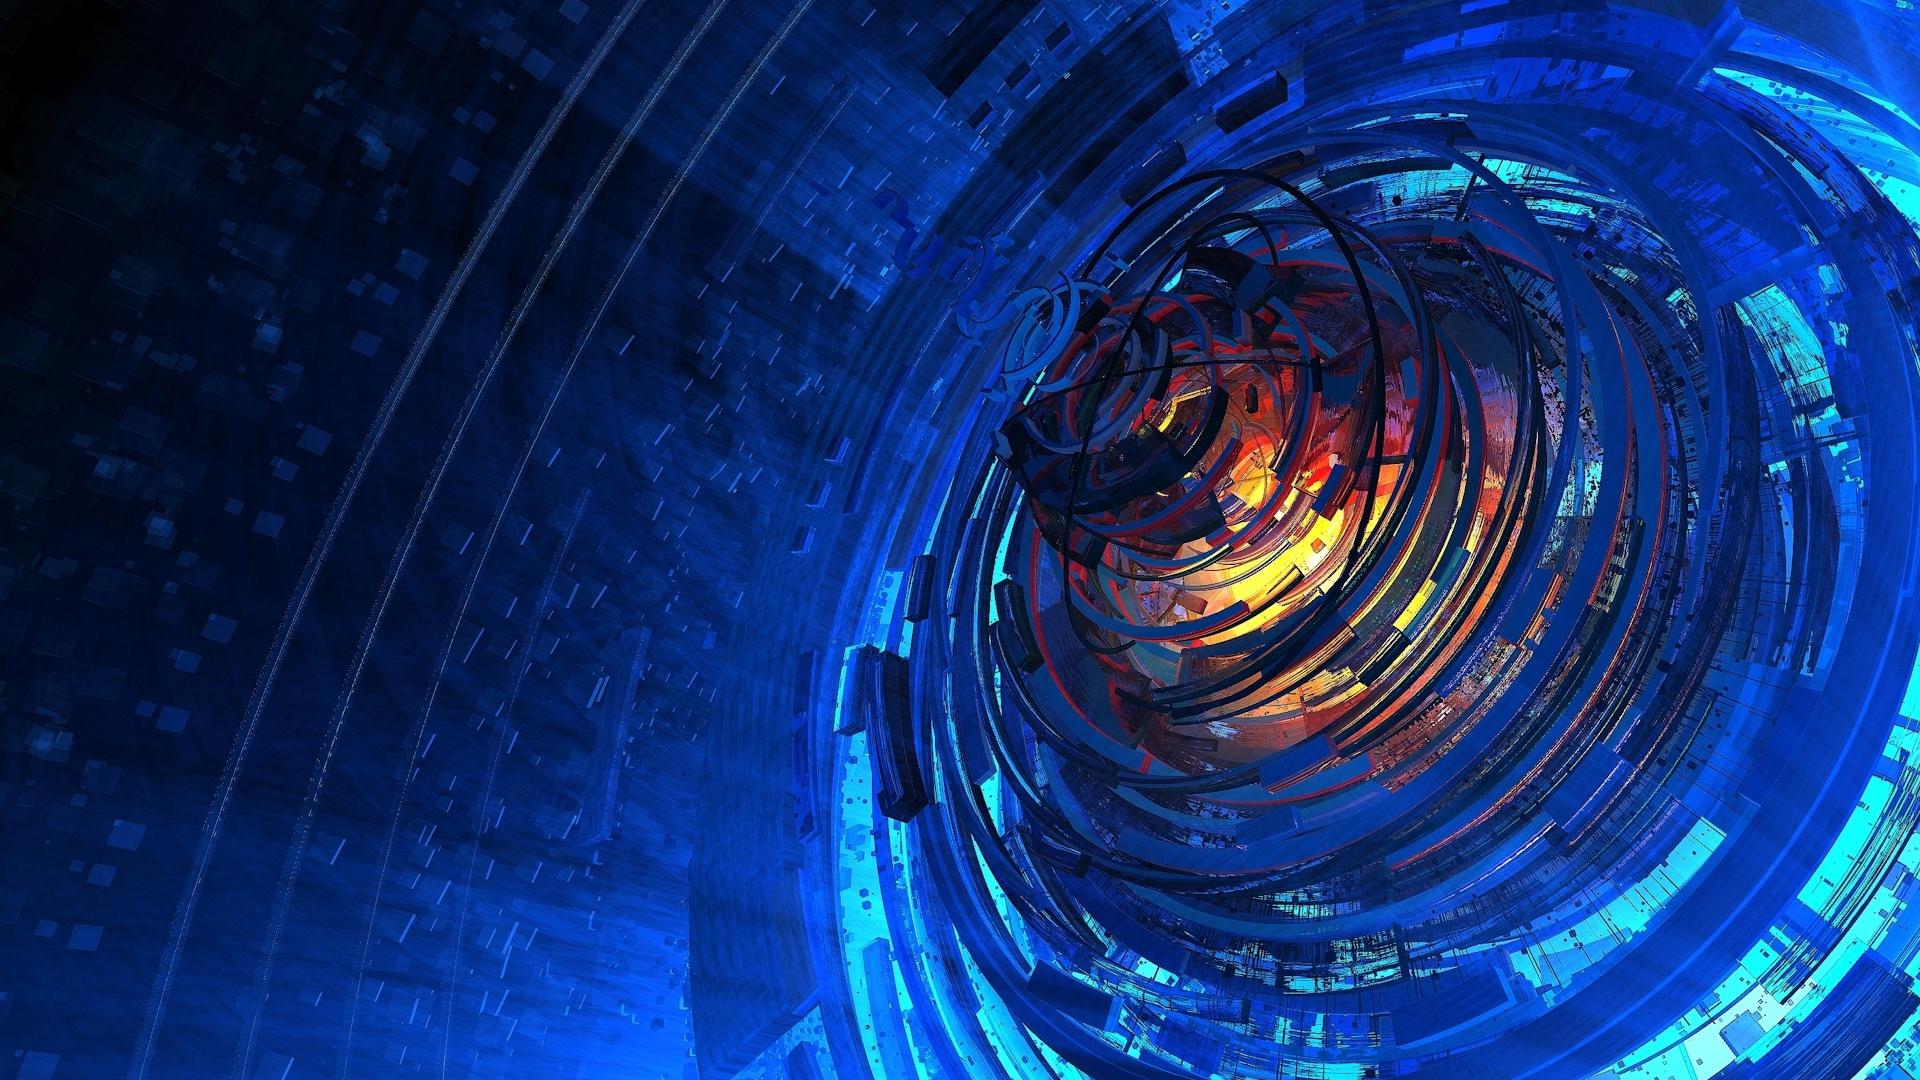 Abstrait Fond d'écran HD | Arrière-Plan | 1920x1080 | ID:421190 - Wallpaper Abyss